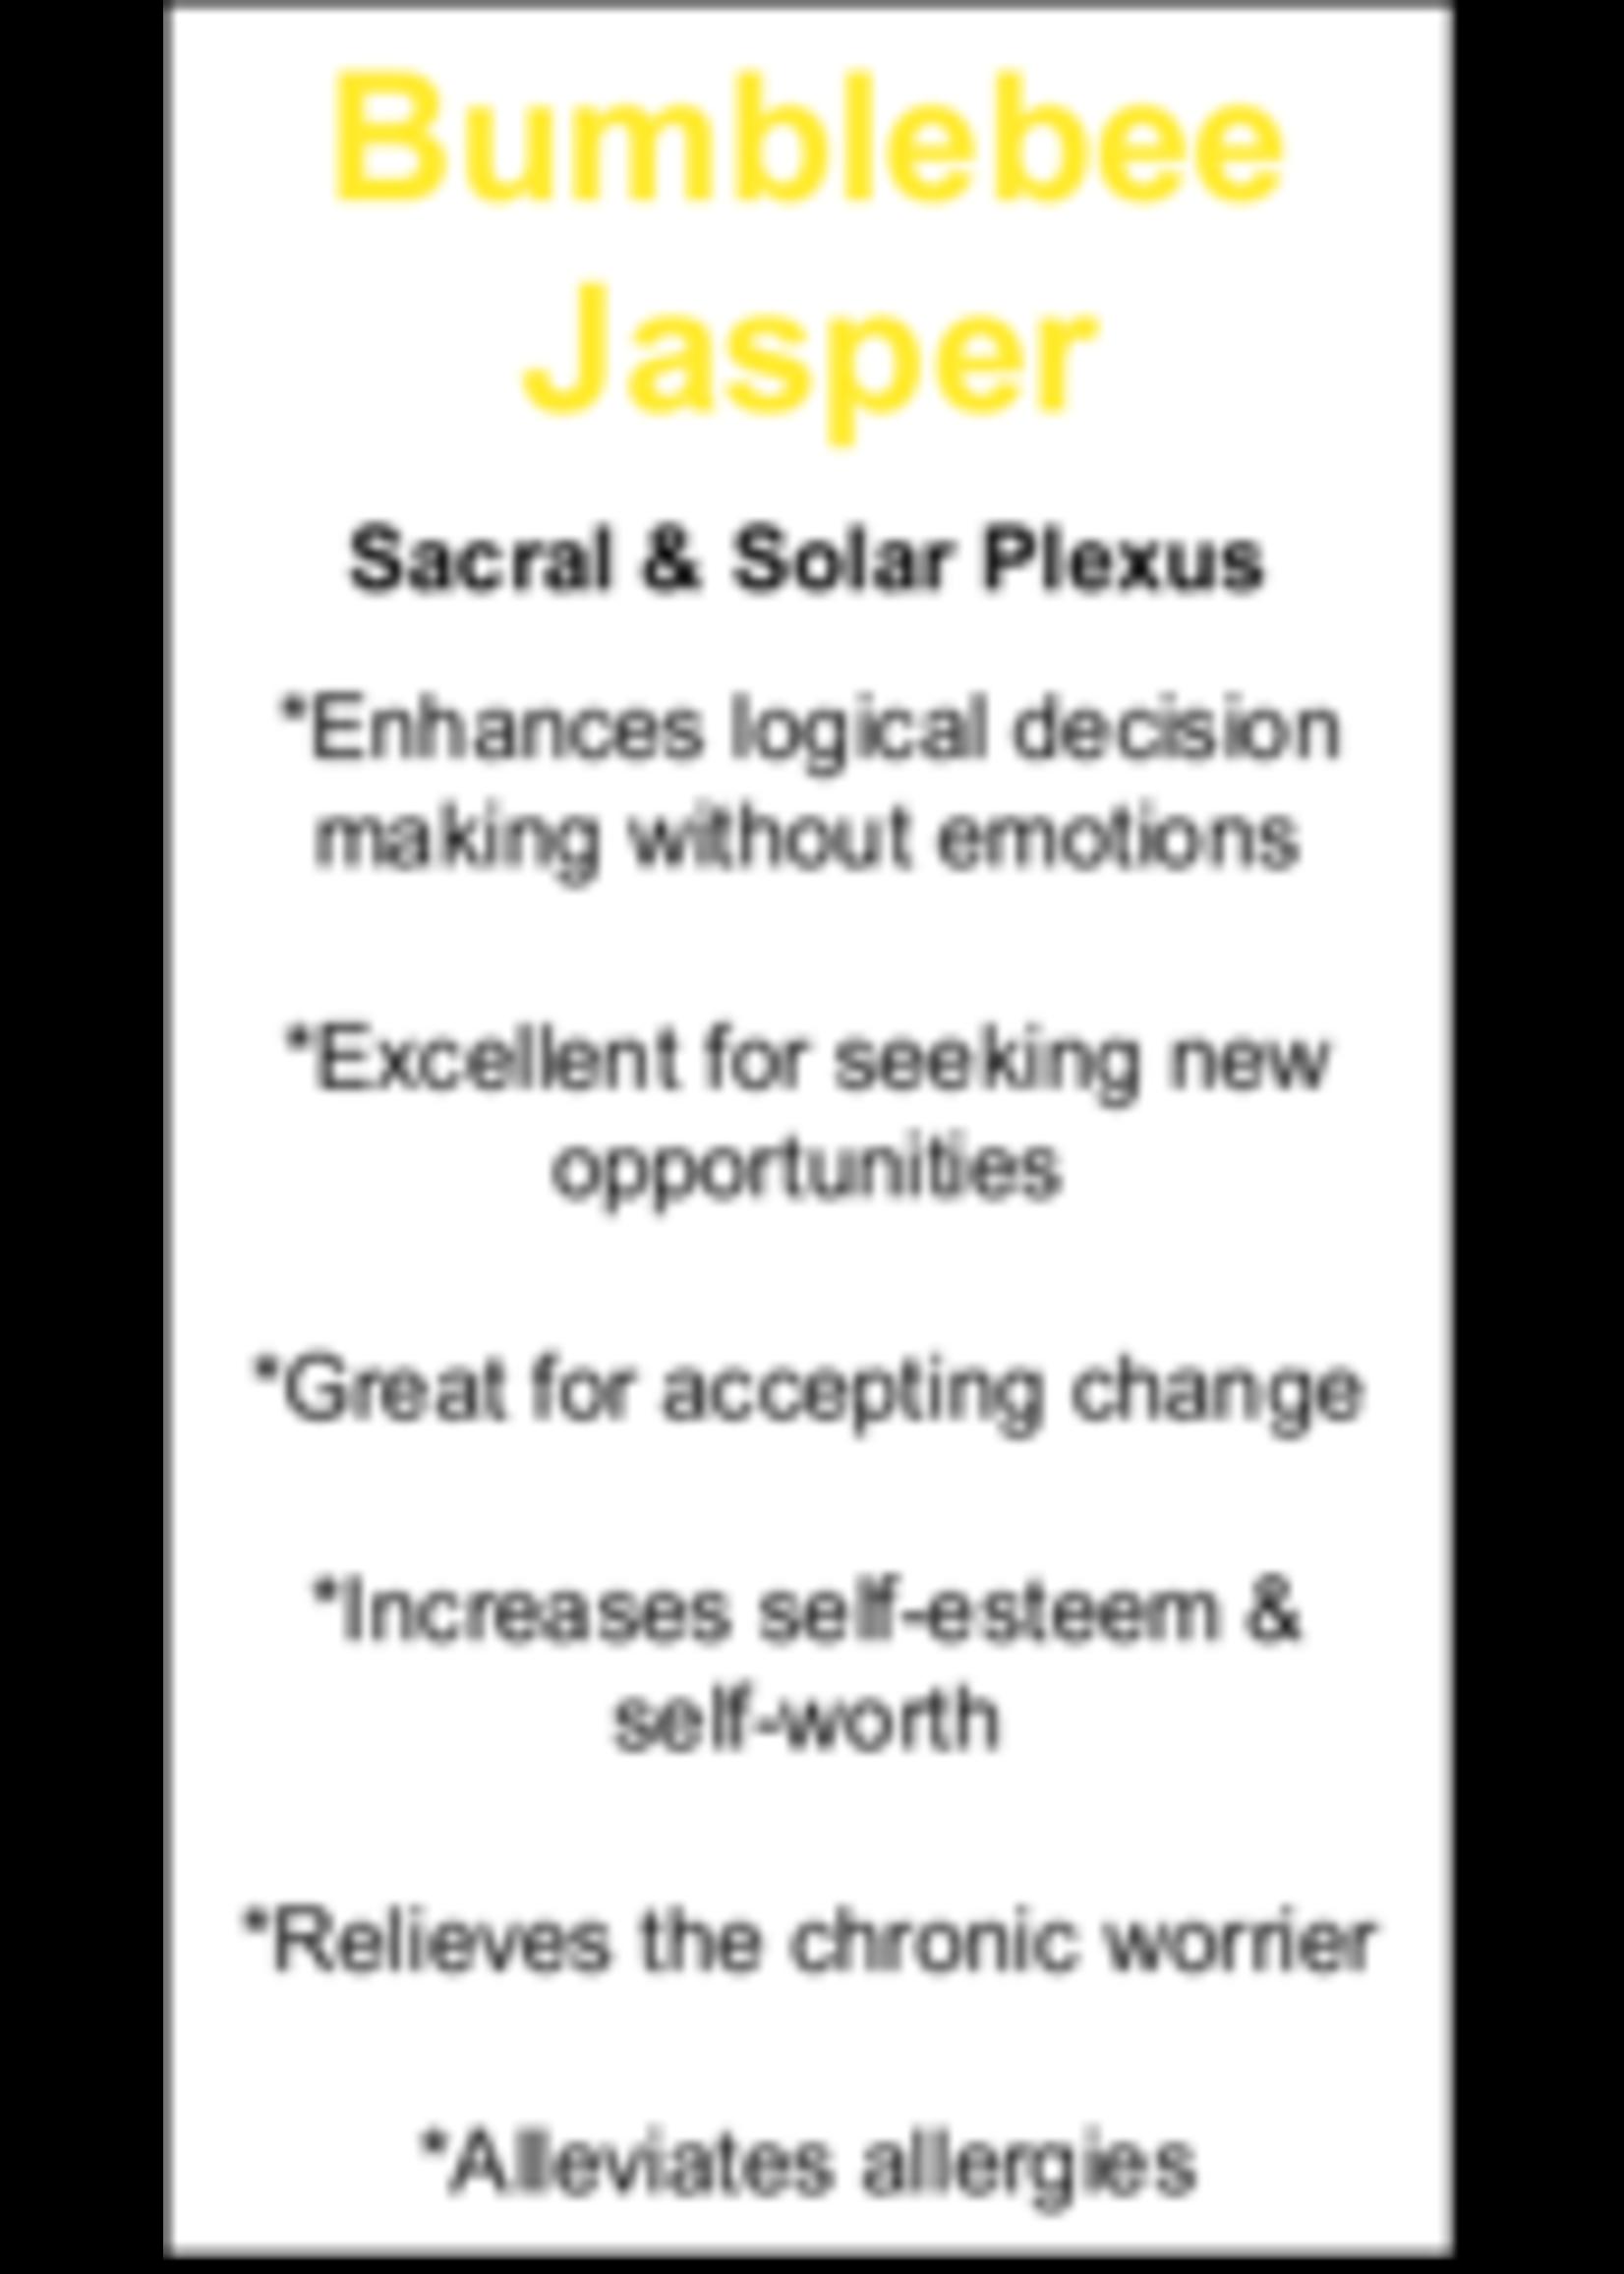 Bumblebee Jasper Cards - Box of 250